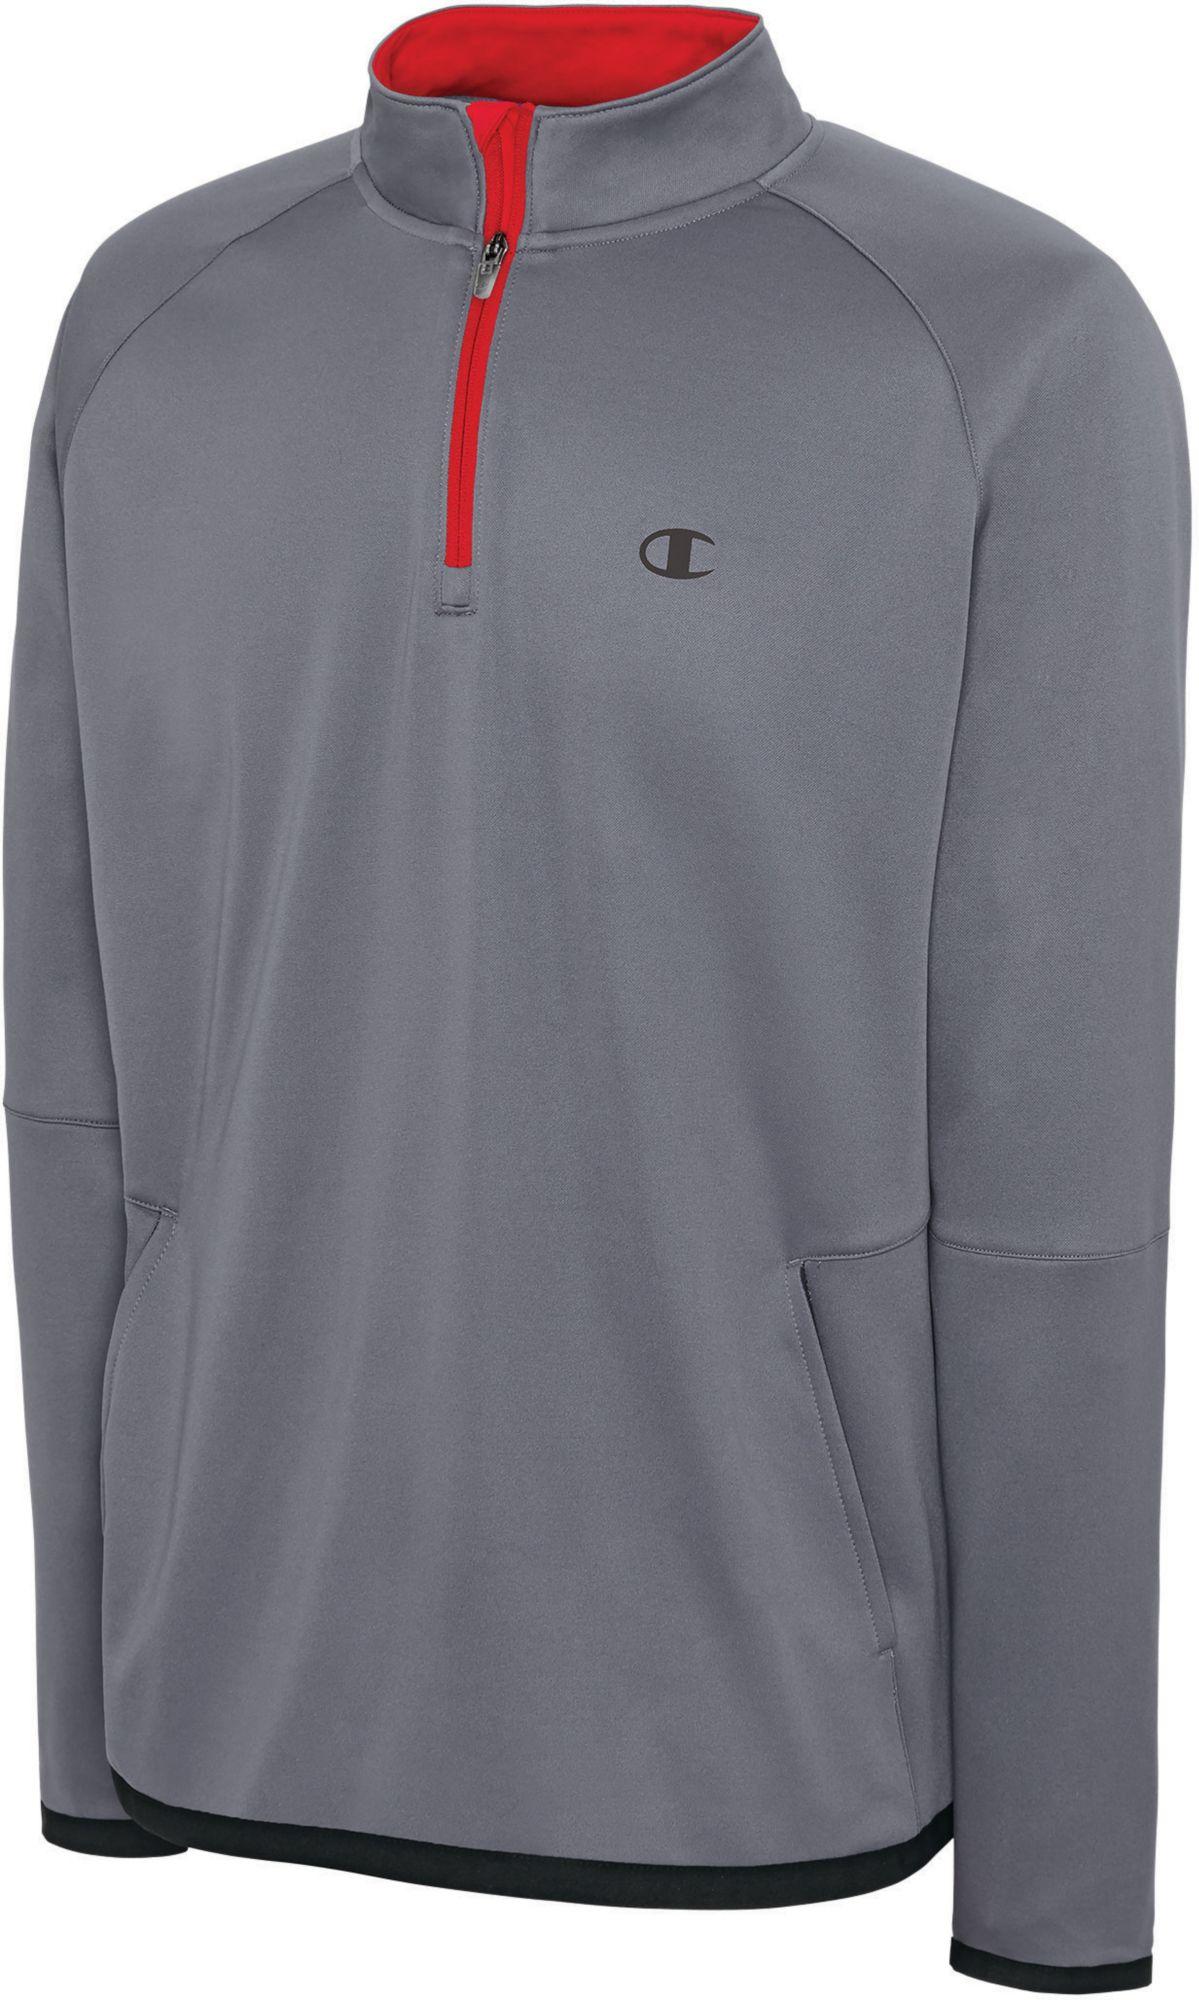 Champion Men's Tech Fleece Quarter Zip Pullover | DICK'S Sporting ...